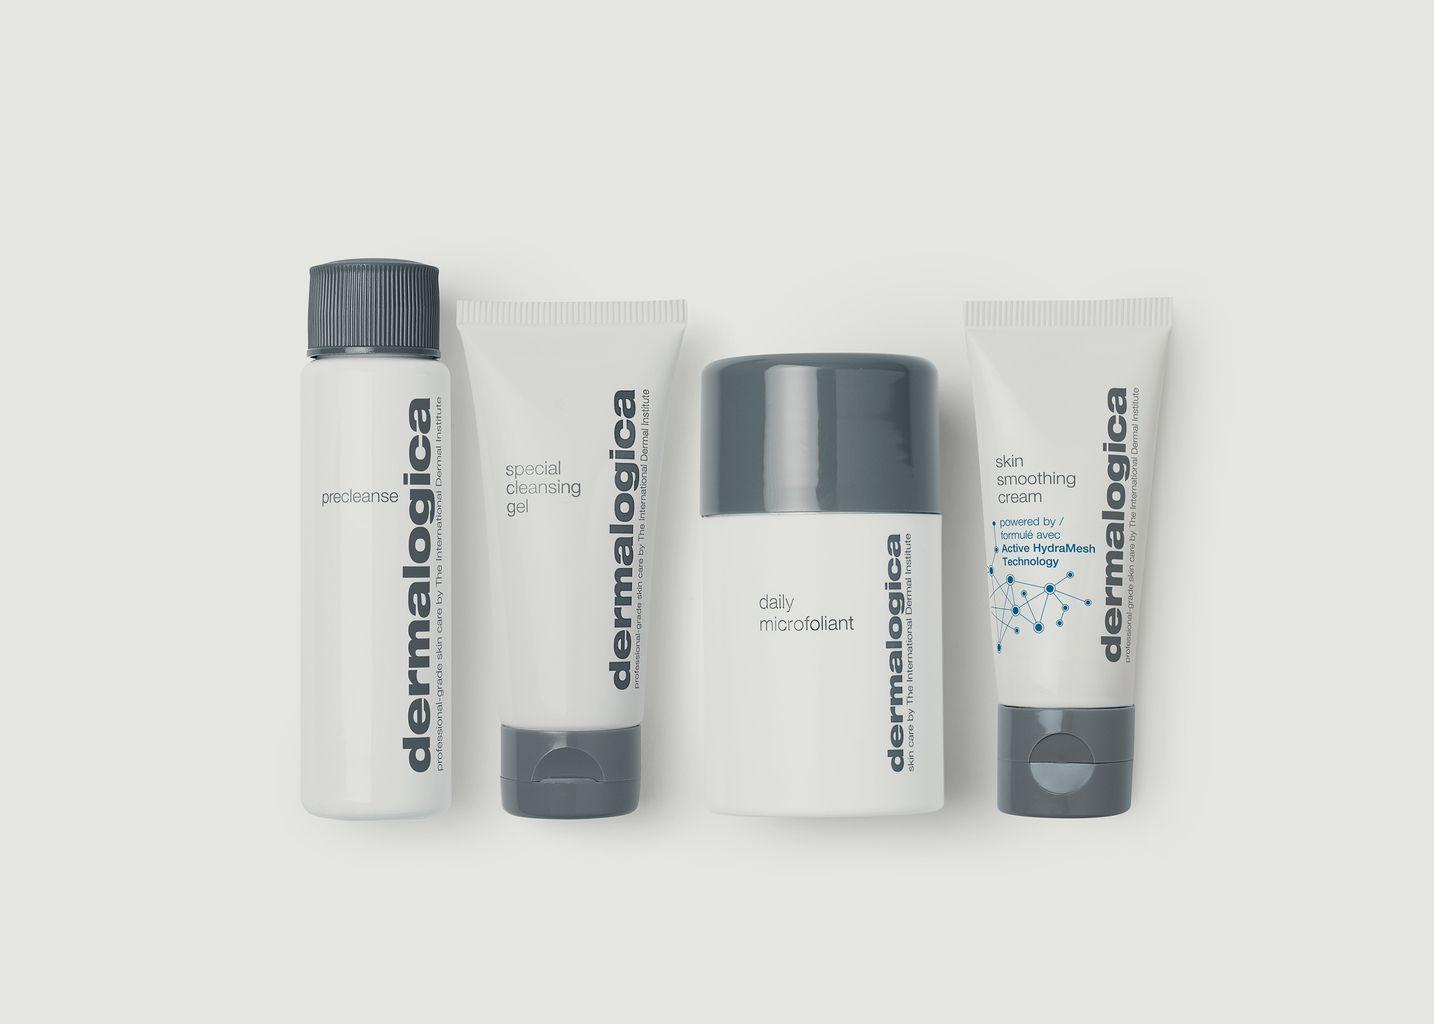 Discover Healthy Skin Kit - Dermalogica